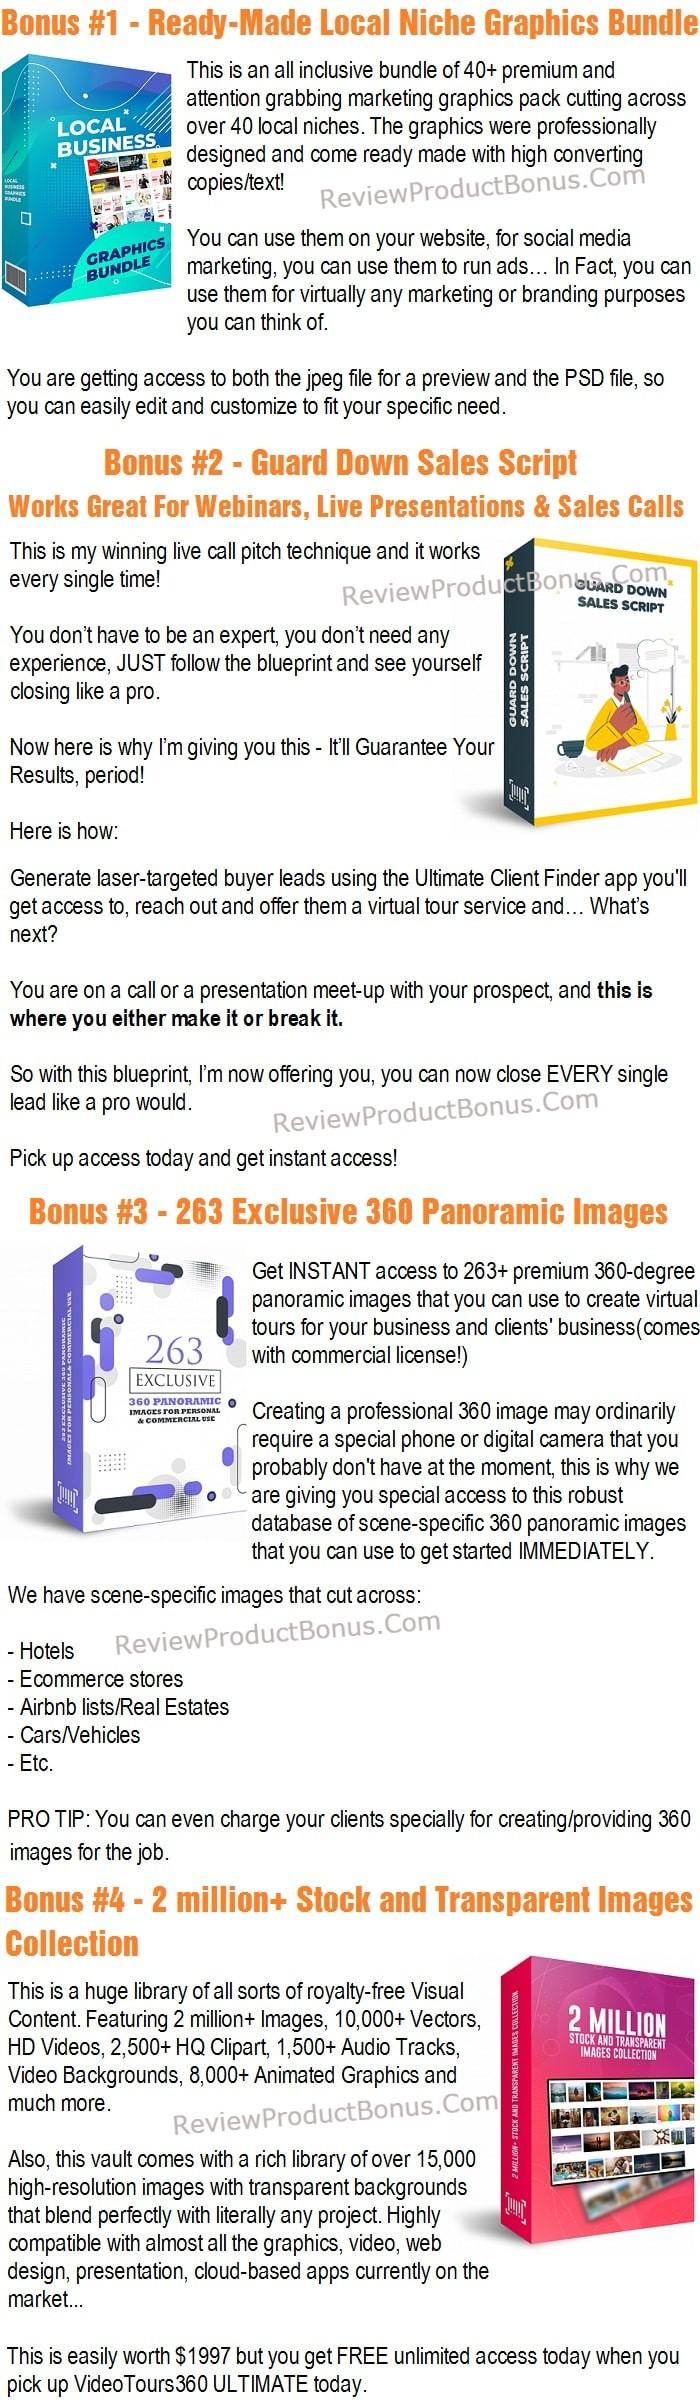 VideoTours360 Ultimate Bonus